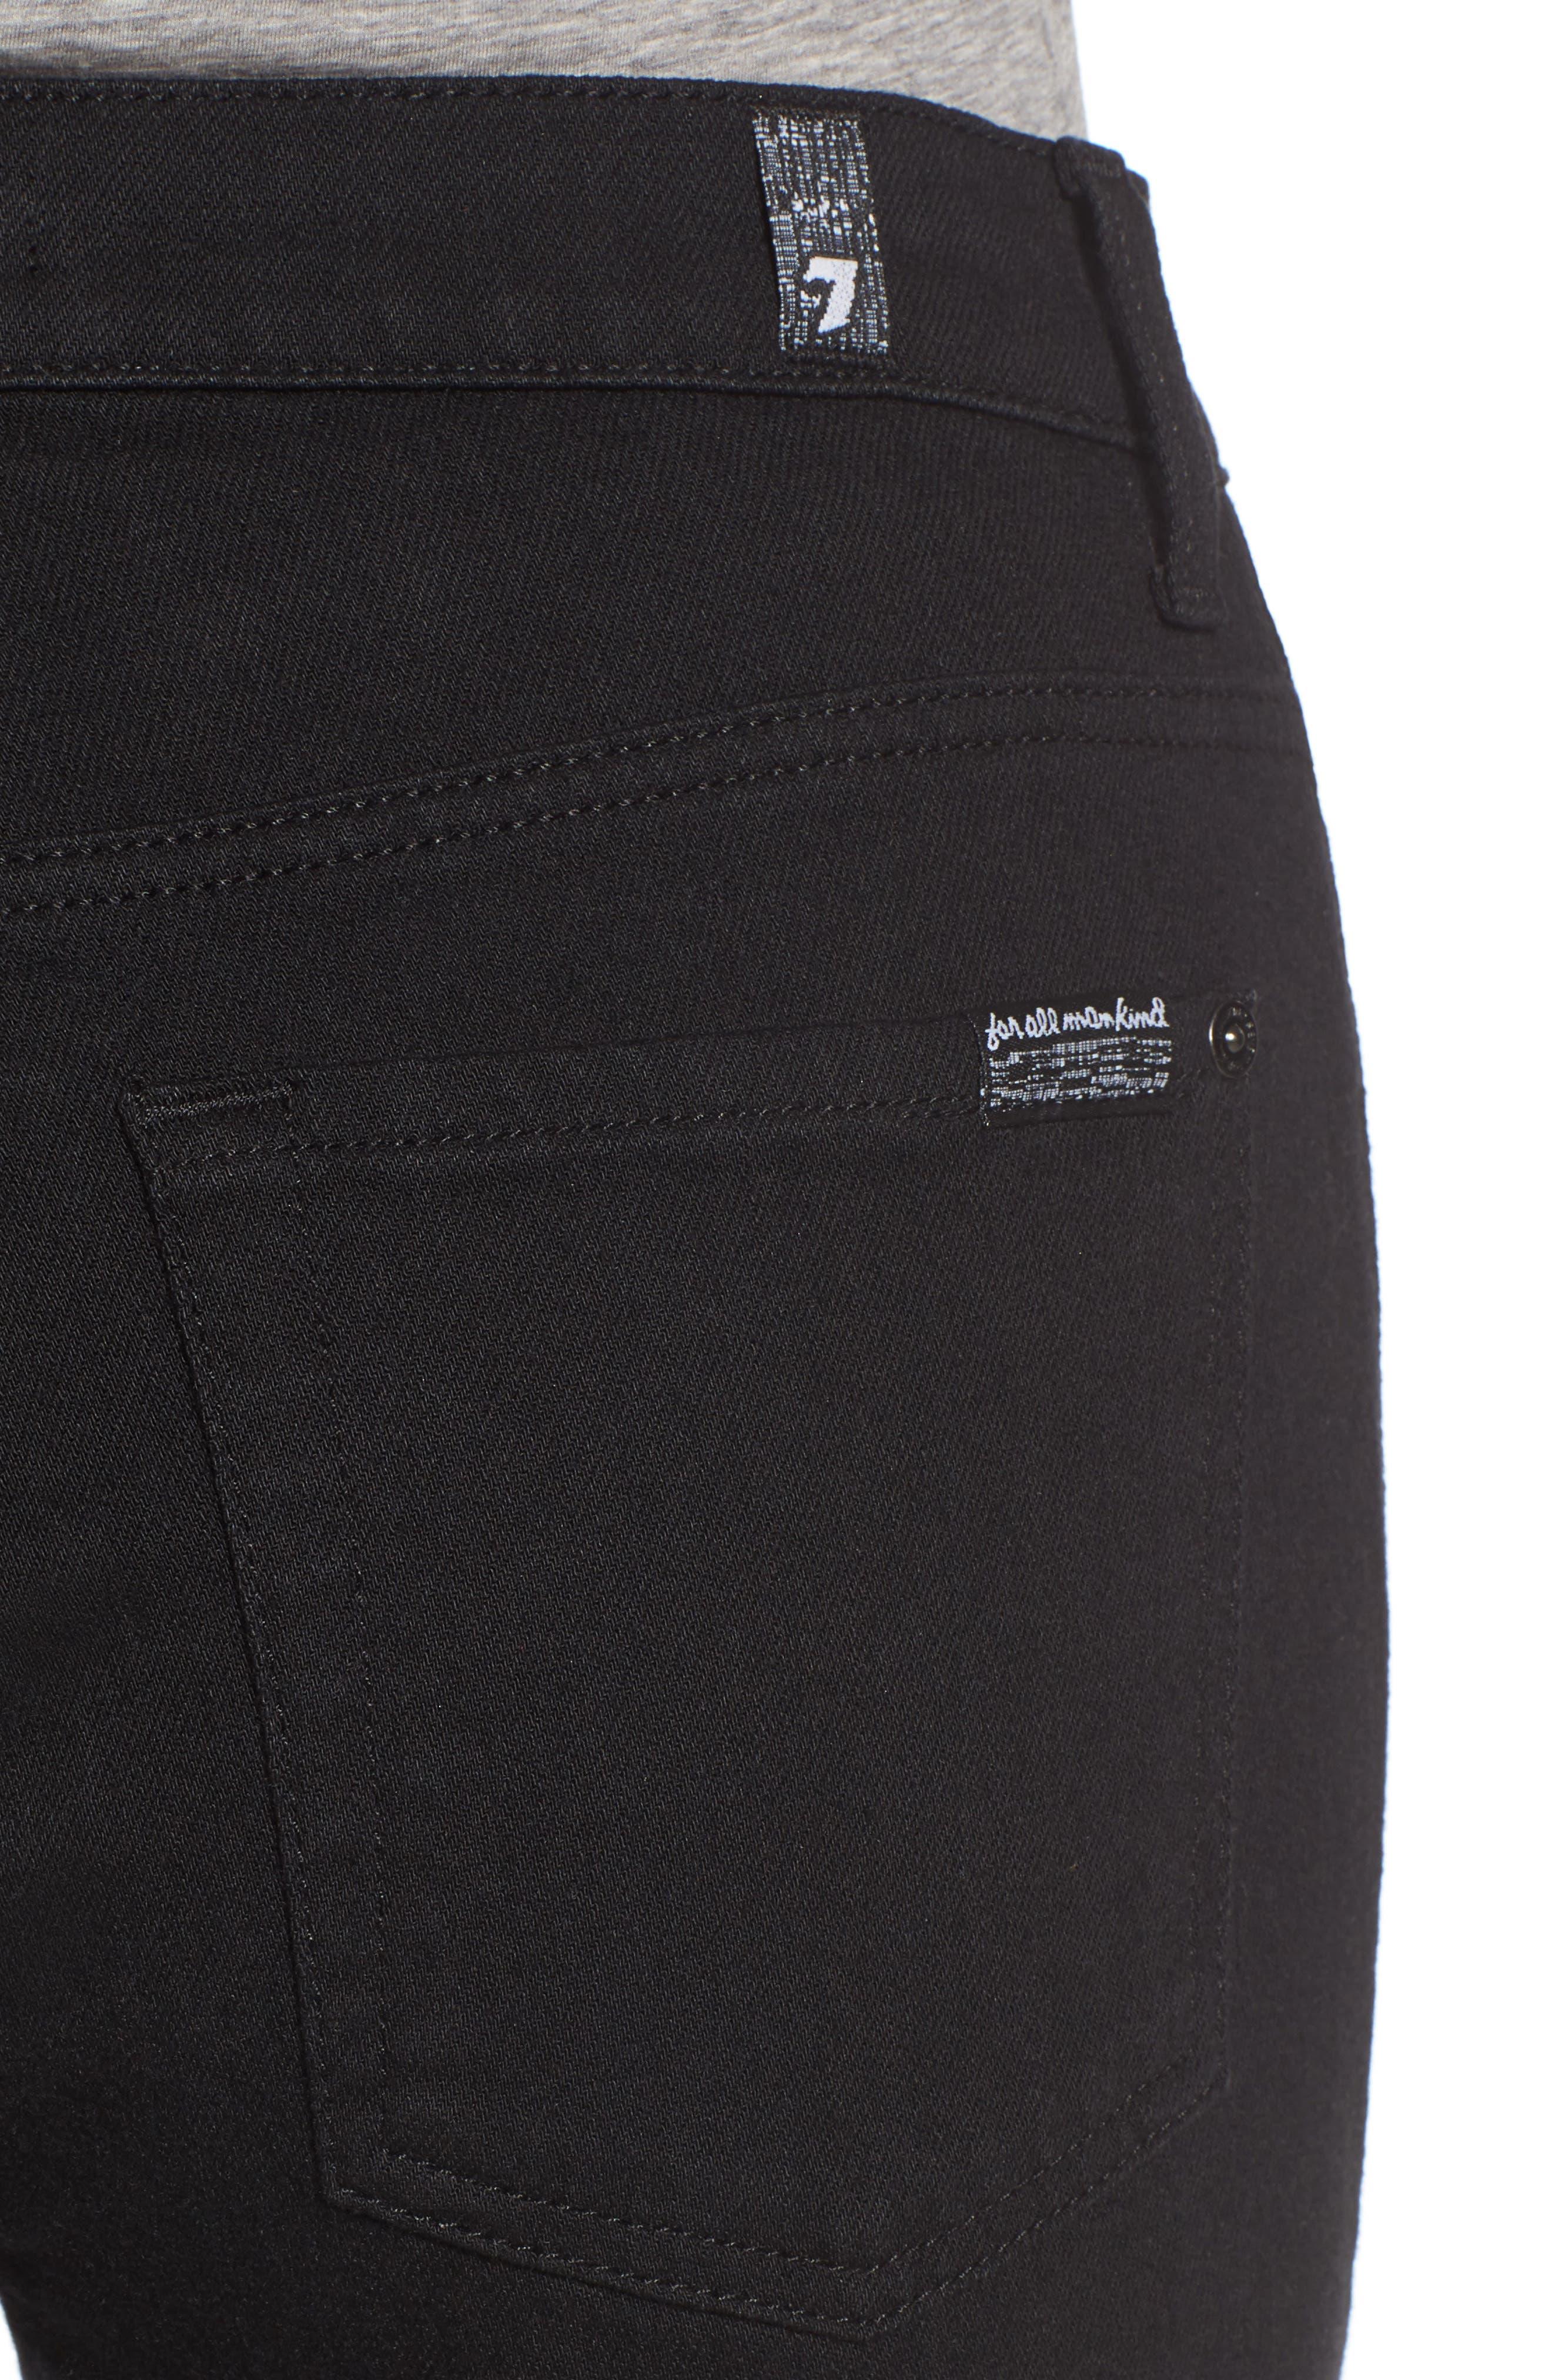 Alternate Image 4  - 7 For All Mankind® Priscilla High Waist Crop Flare Jeans (Night Black)